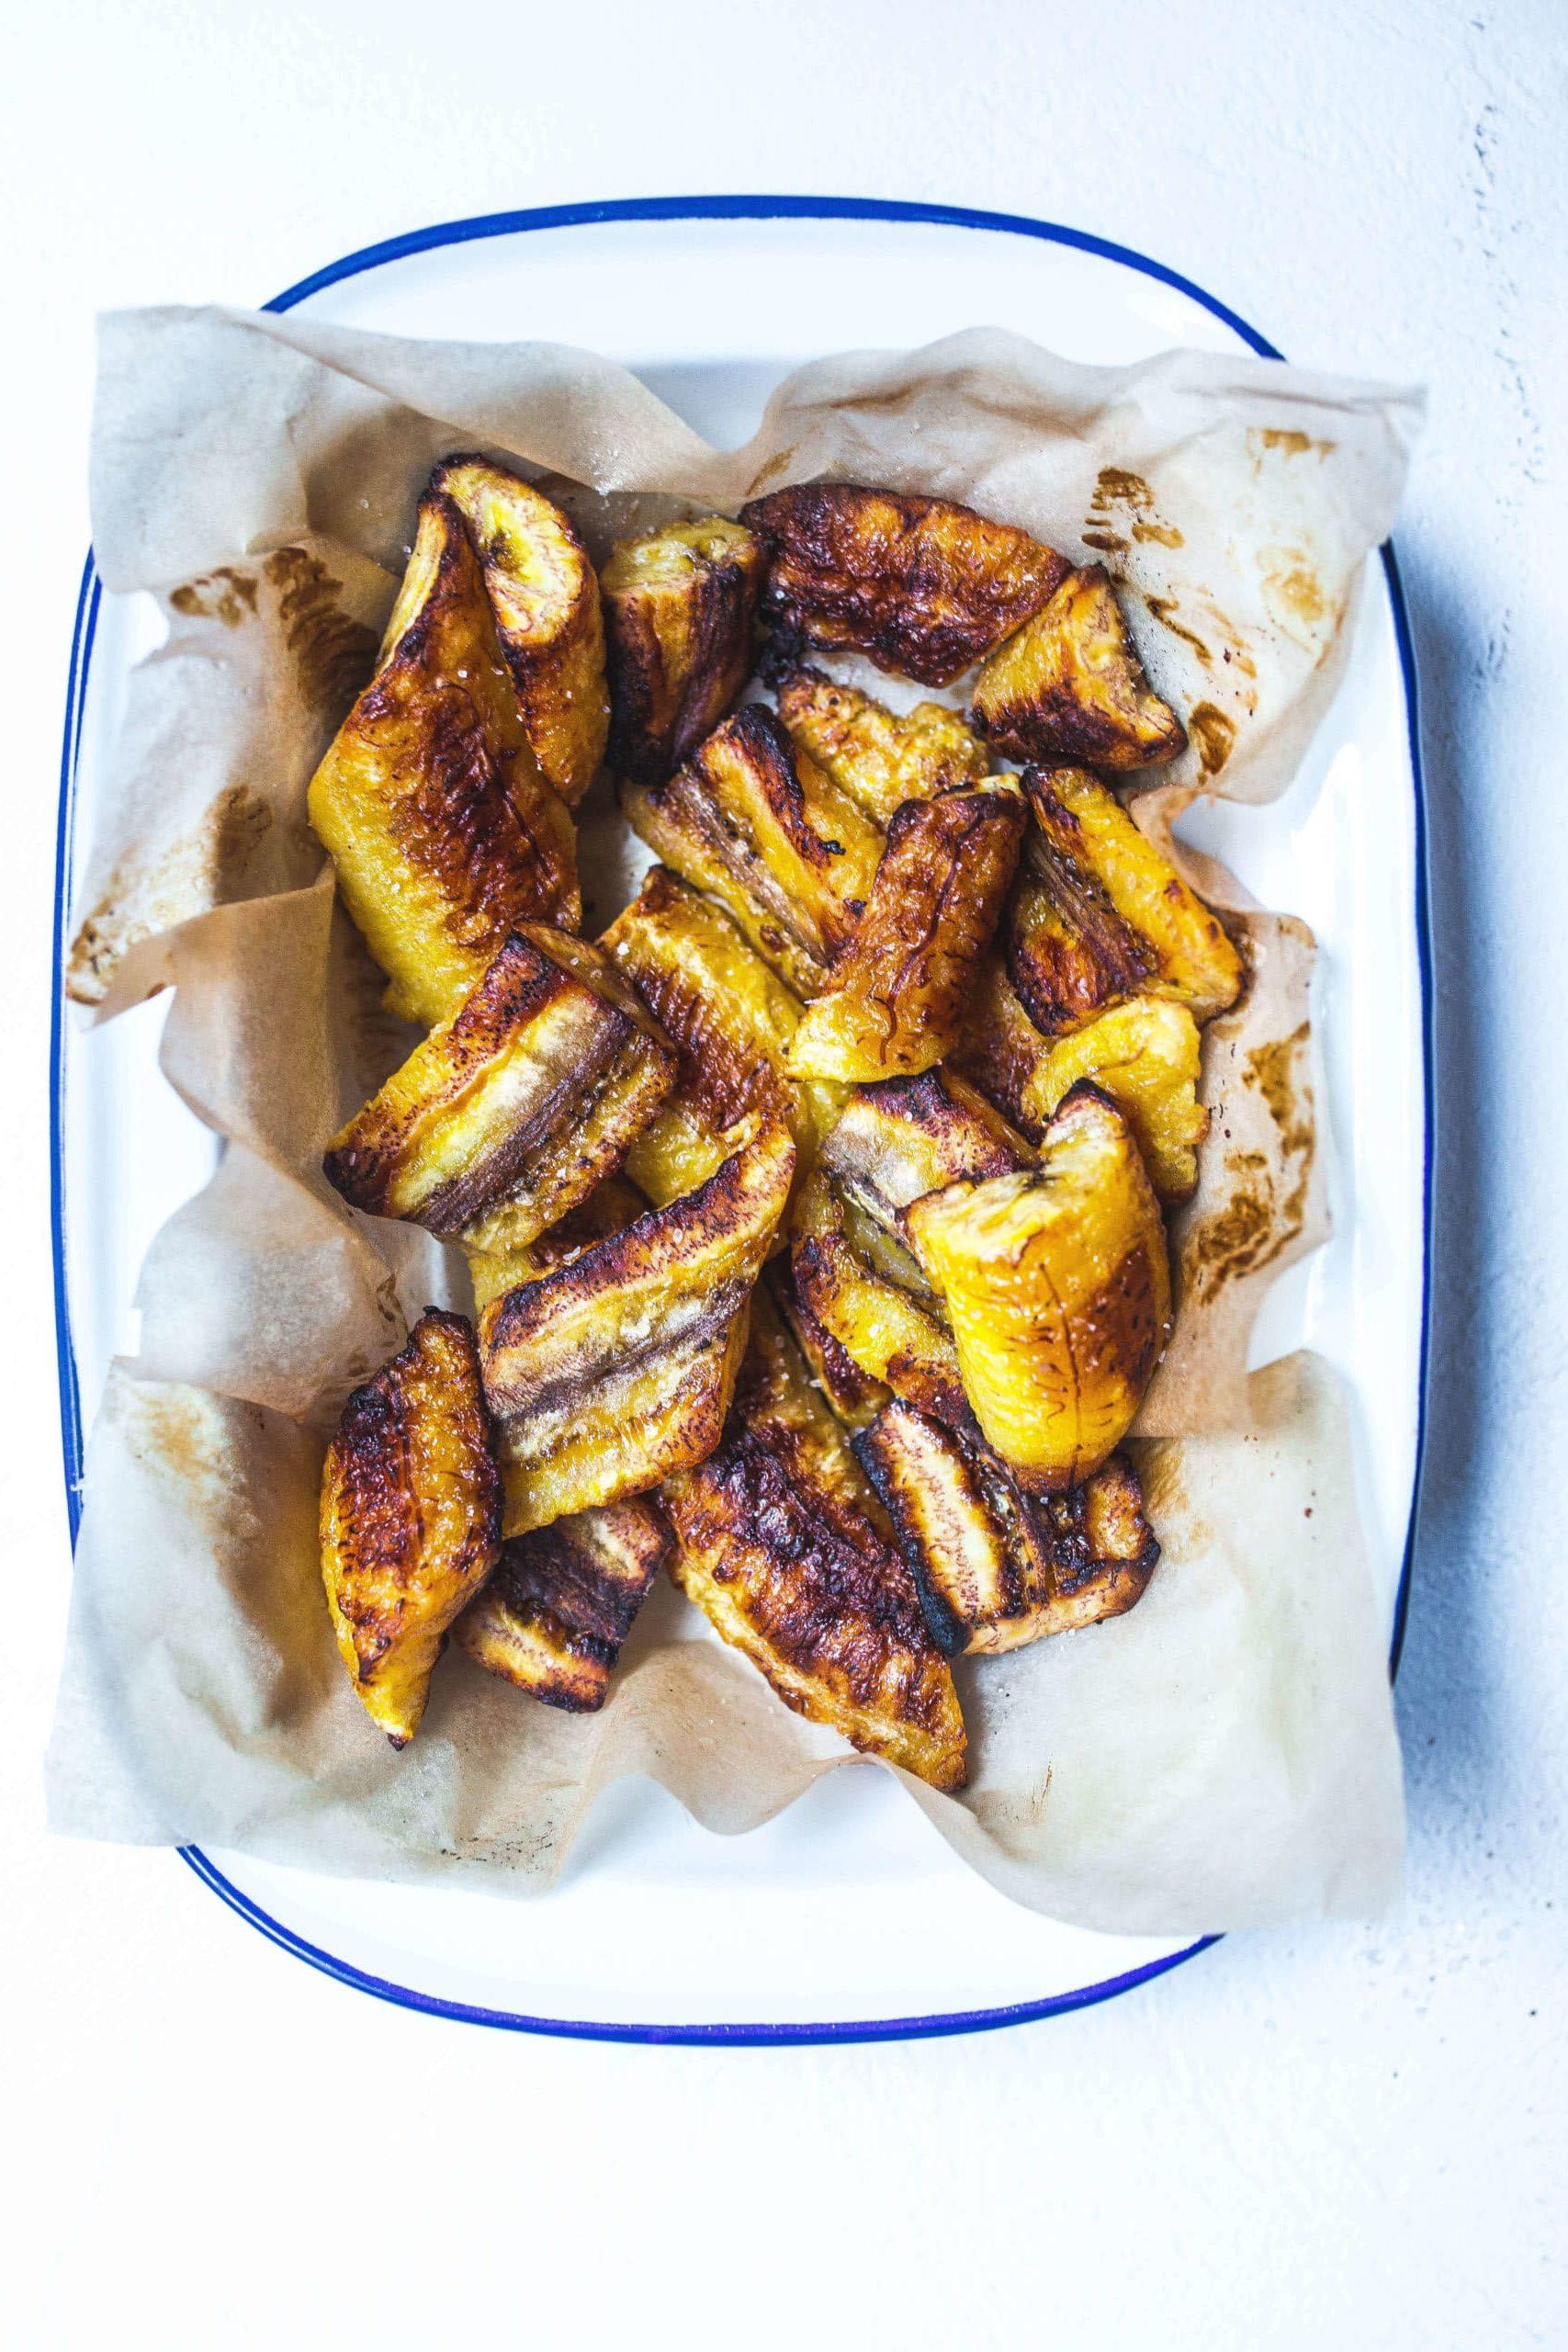 oven roasted sweet plantains recipe (maduros) via Food by Mars